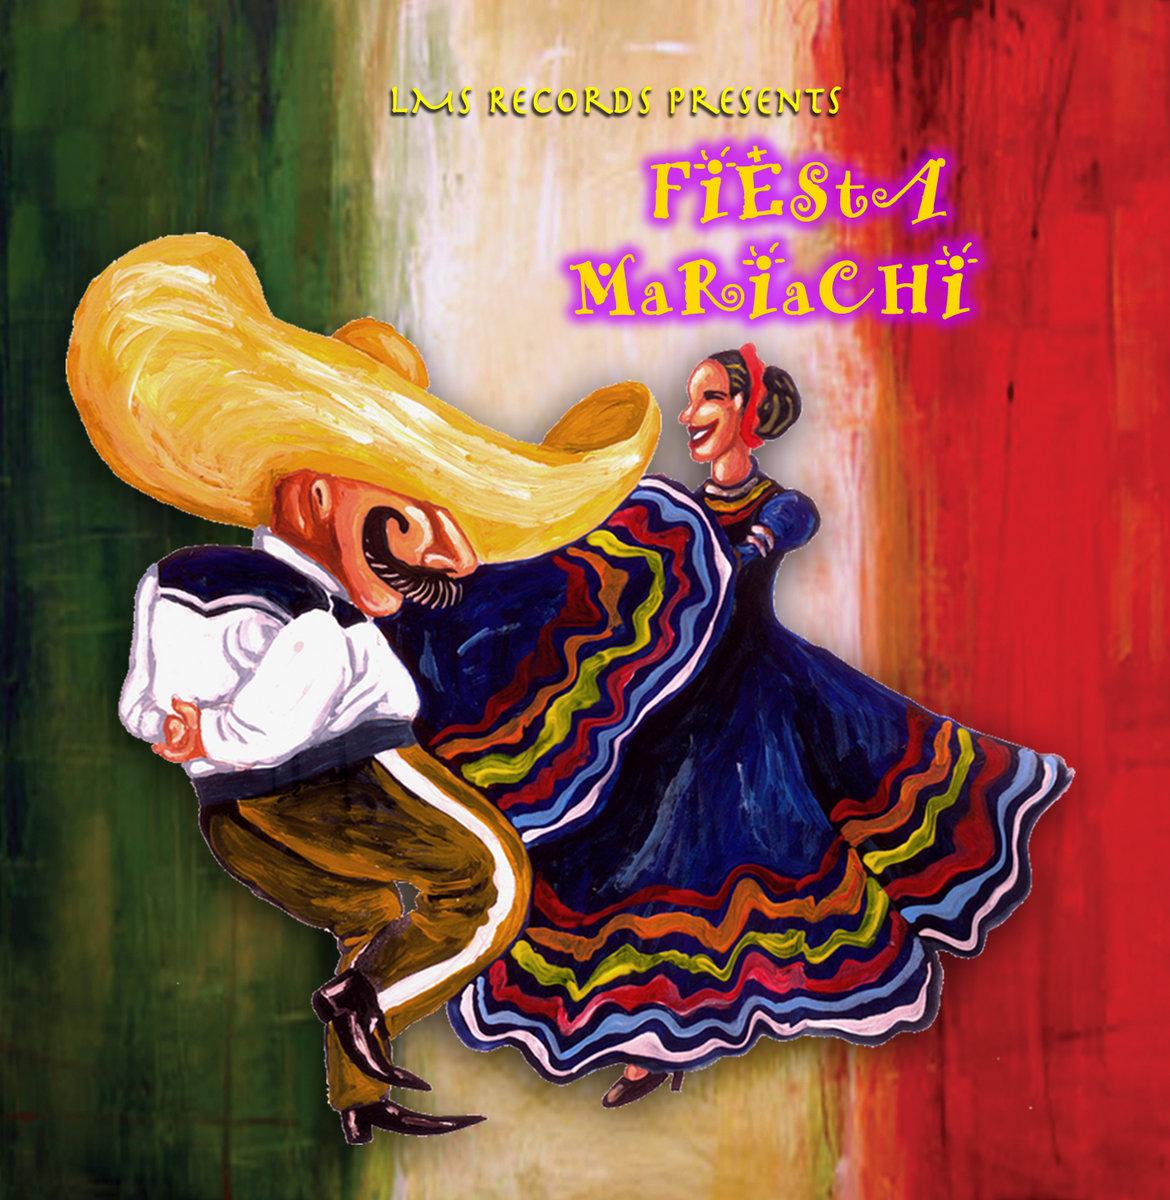 Cumpleanos feliz salsa mp3 download